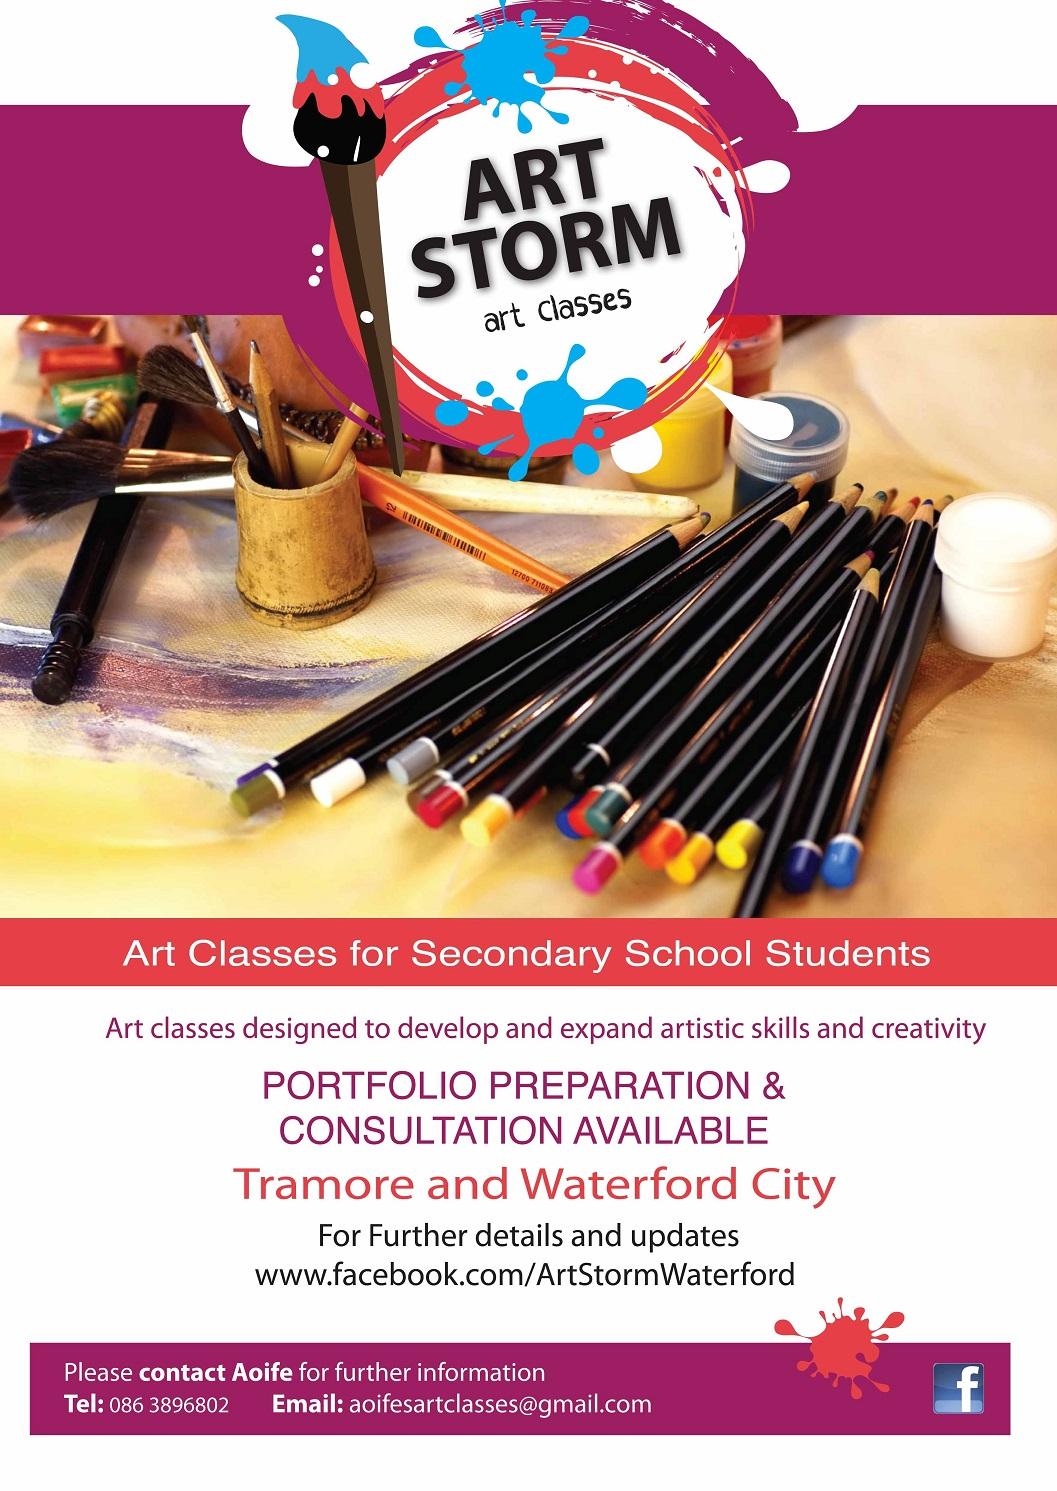 AOIFE BROPHYsecondary Poster ARTSTORM POSTER Spring Art Storm Classes